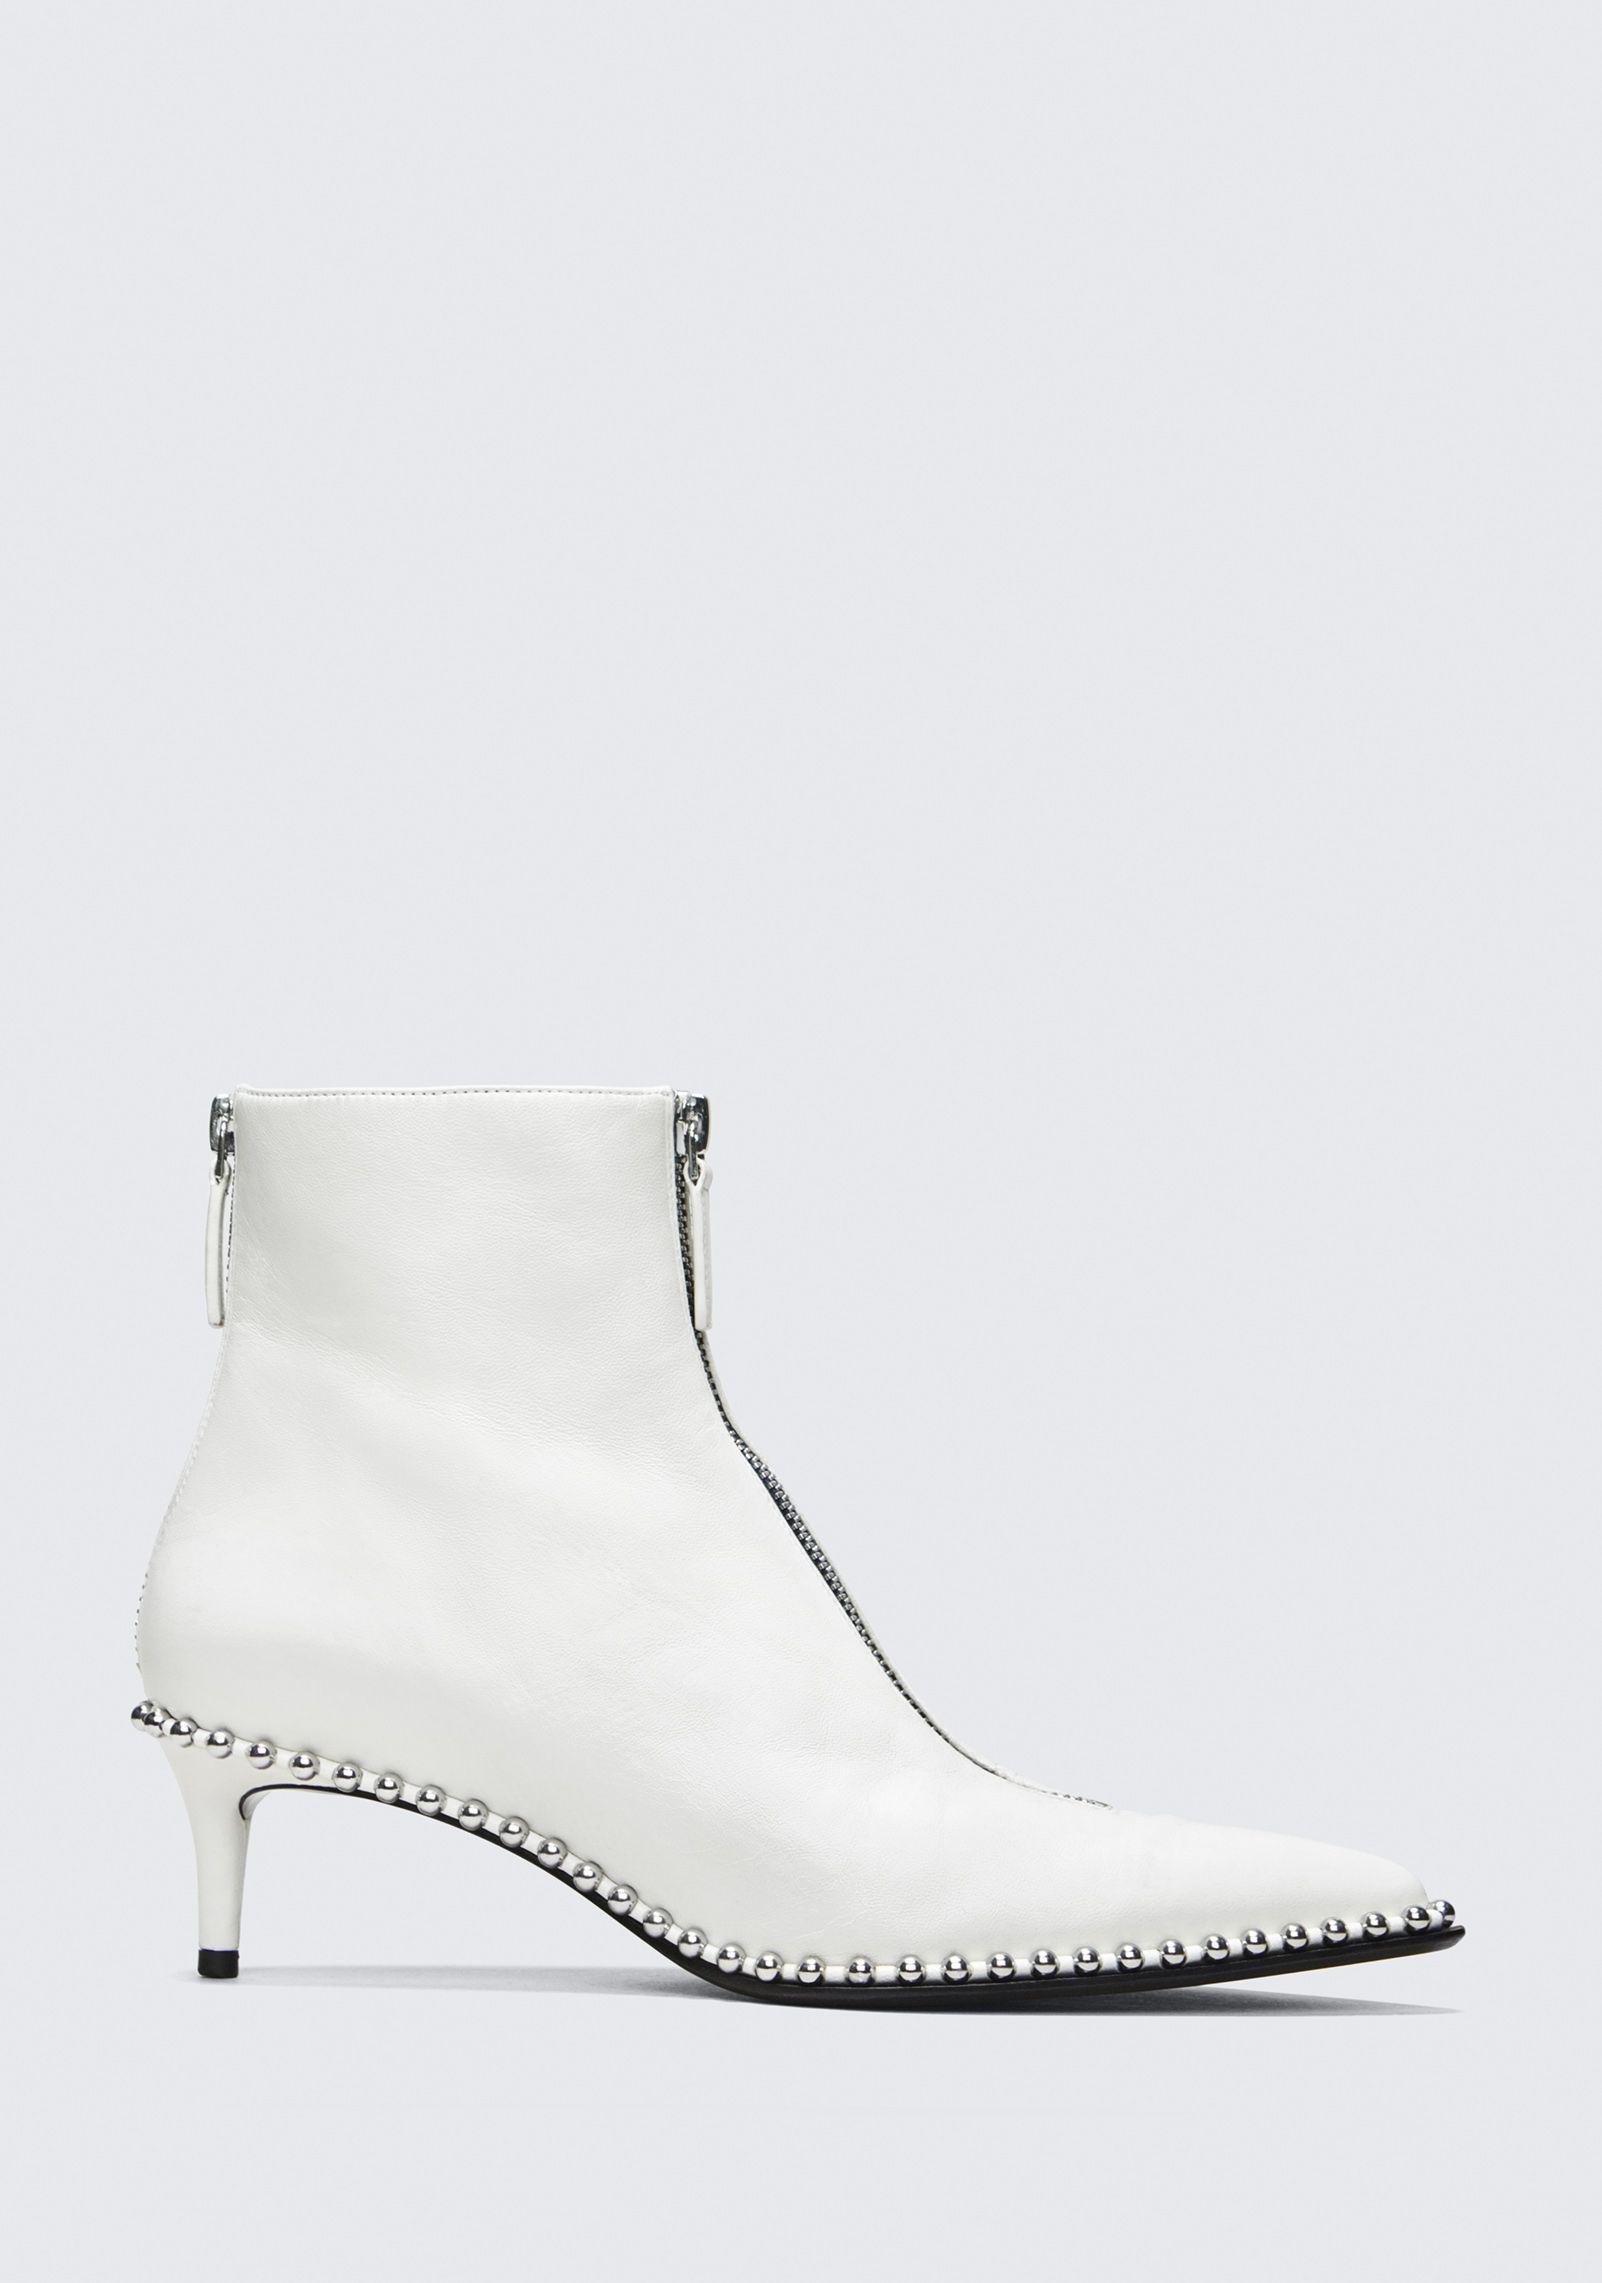 f9fb95eac26 Lyst - Alexander Wang Eri Kitten Heel Bootie in White